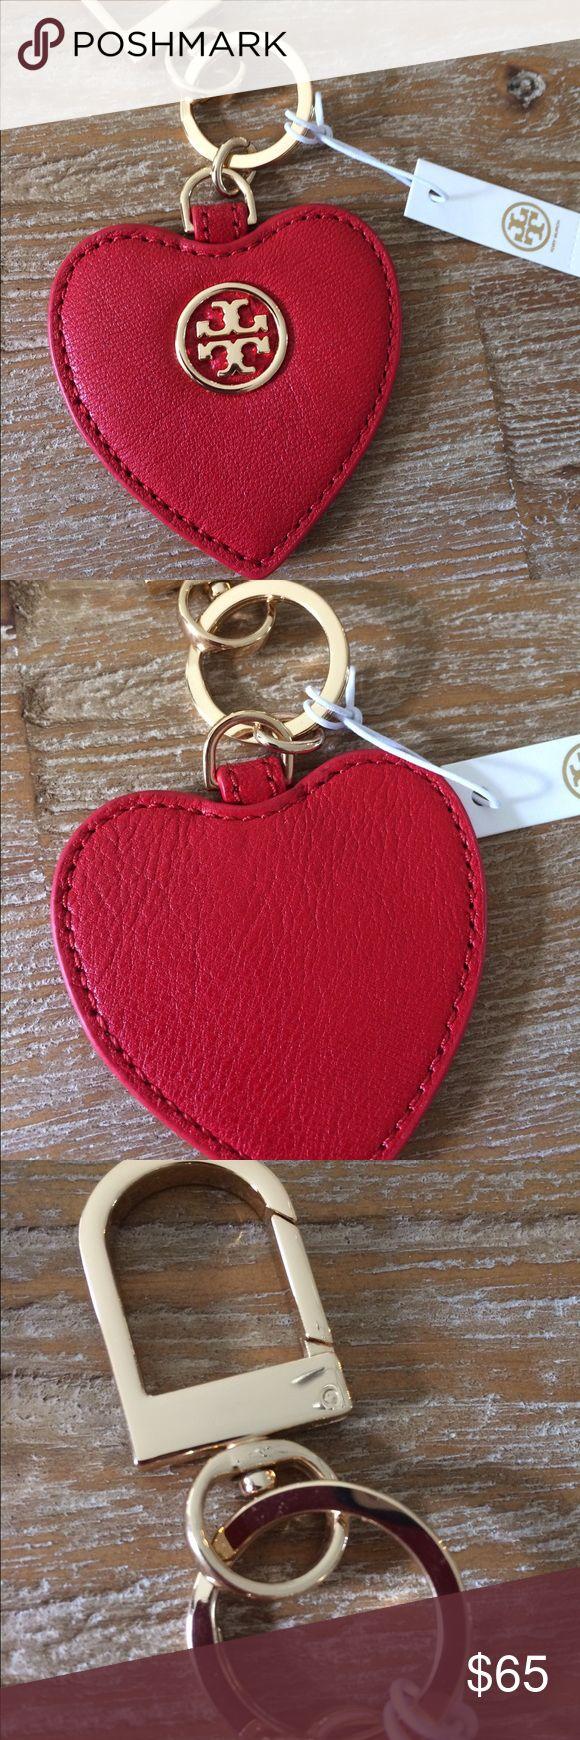 NWT Tory Burch Key Fob NWT Tory Burch Leather Heart ❤️ Key Fob. Ships same day! Tory Burch Accessories Key & Card Holders